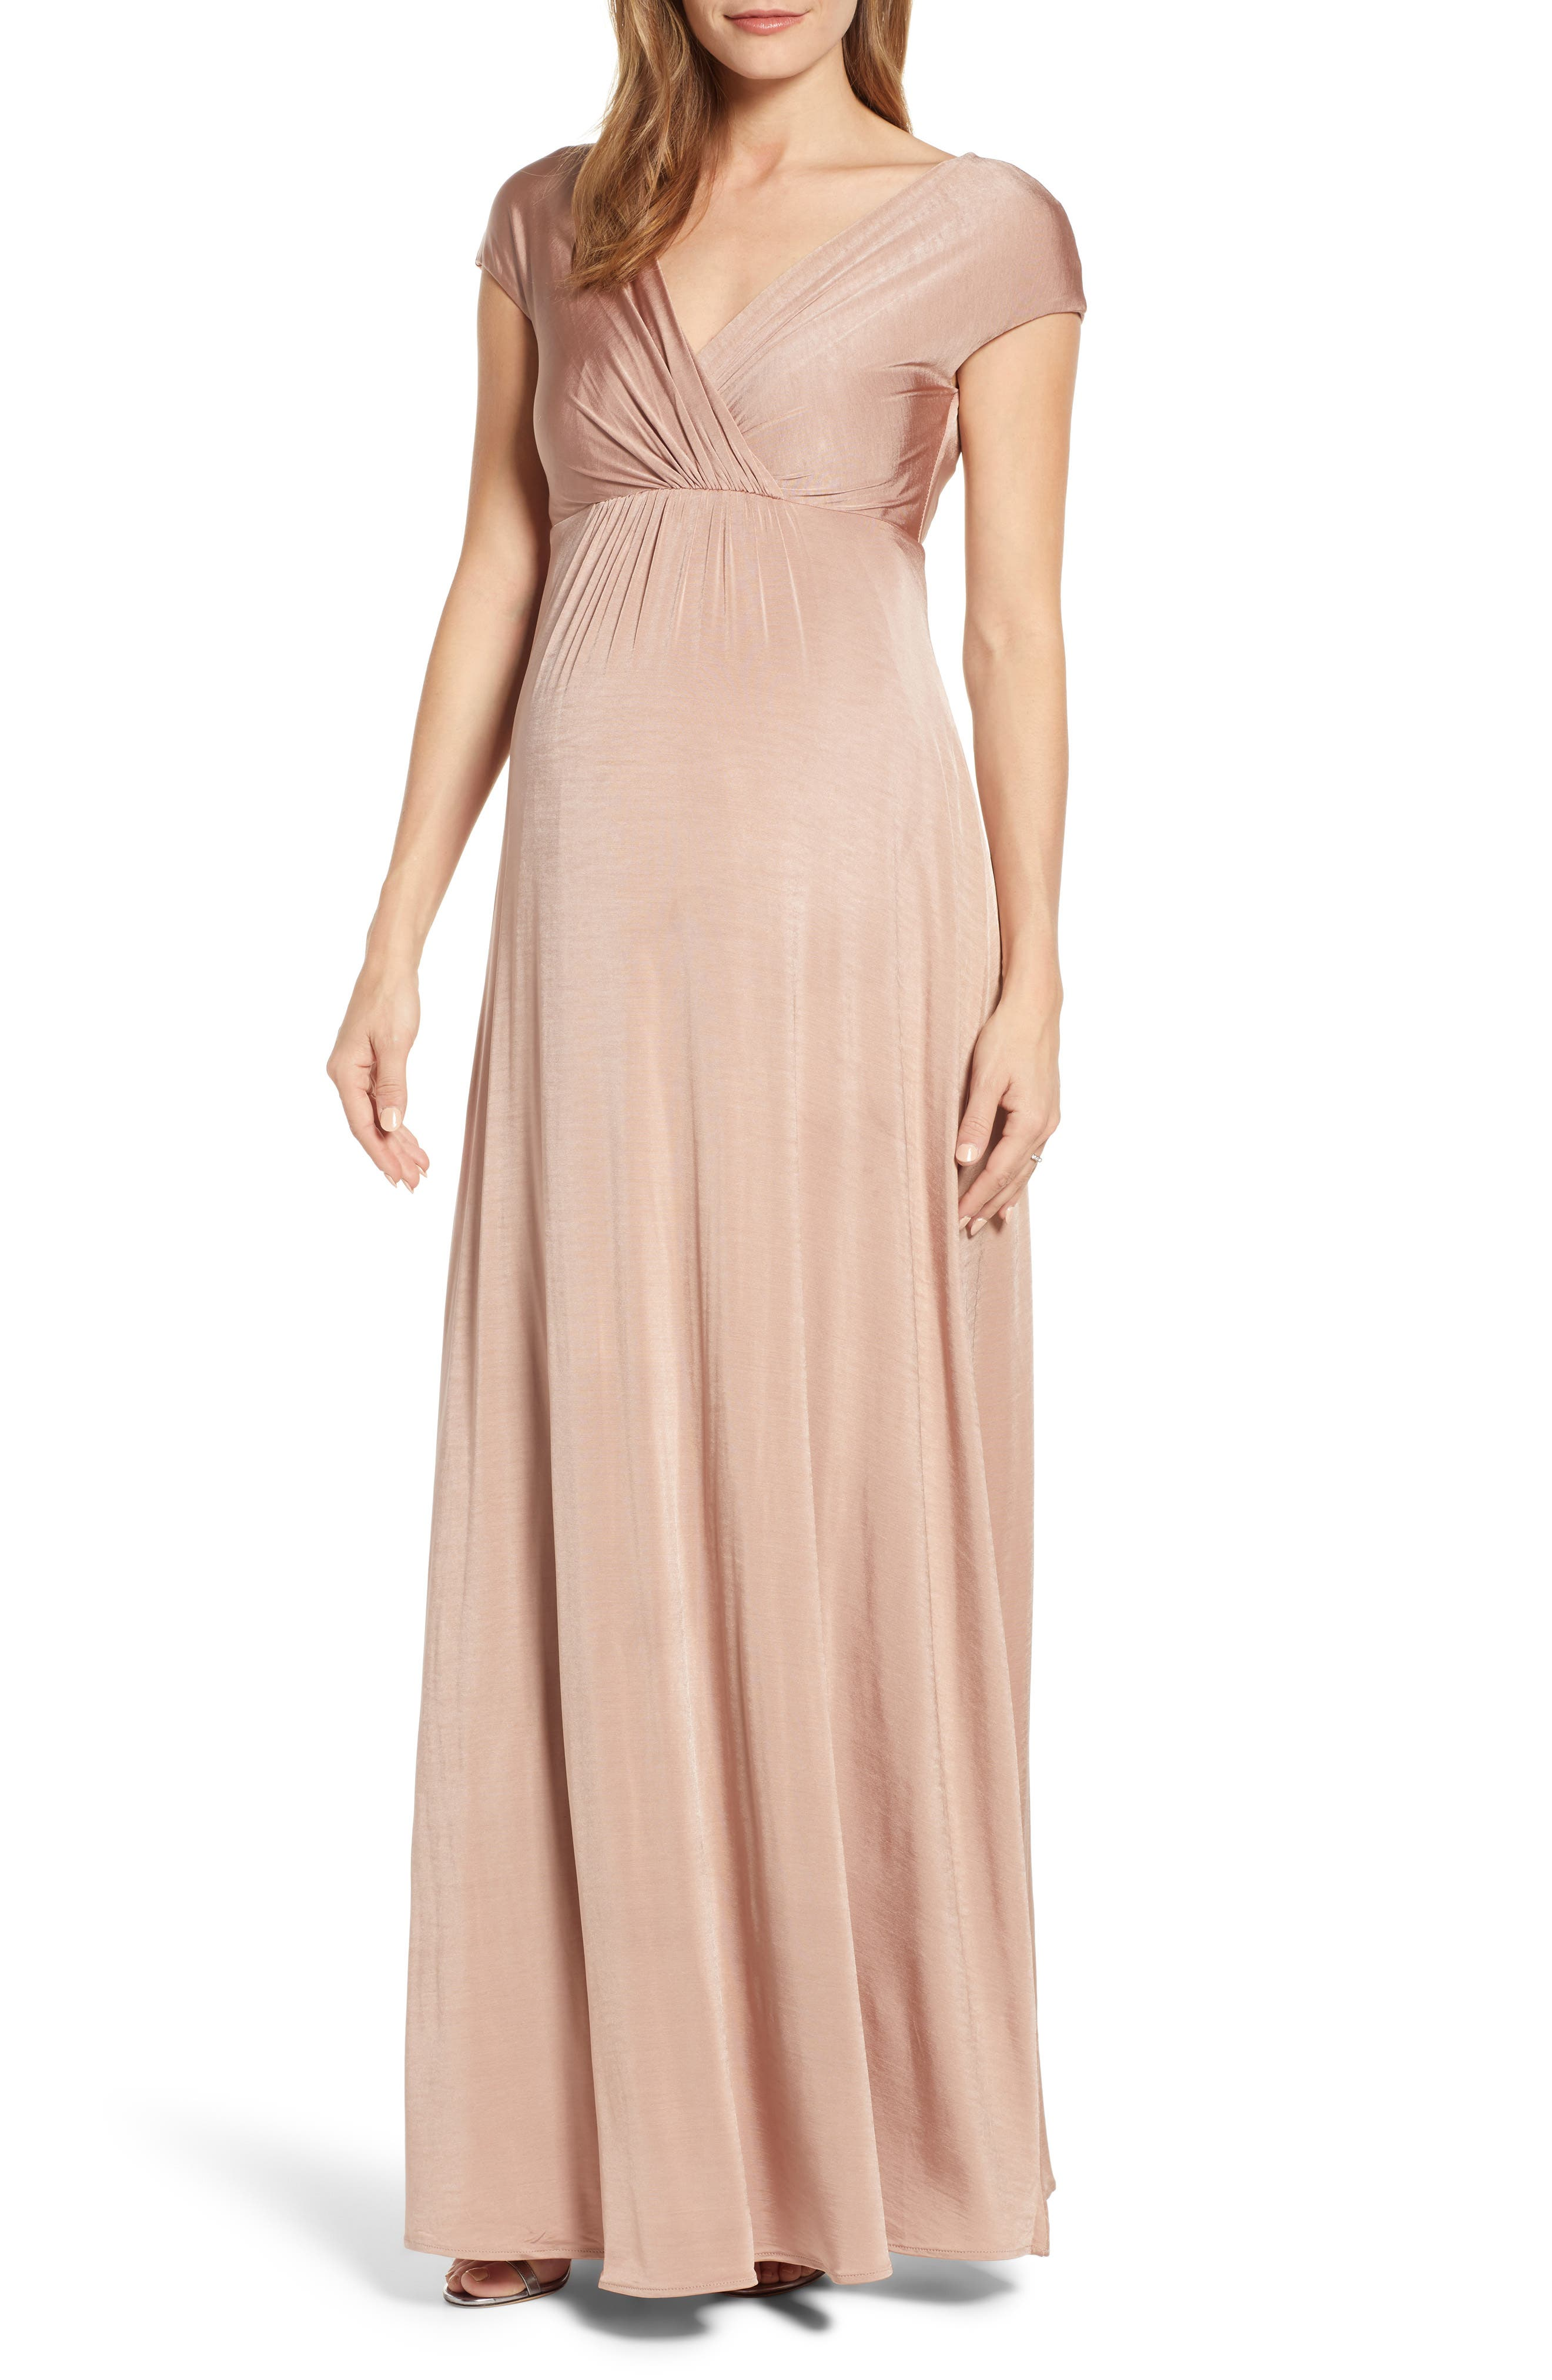 Tiffany Rose Francesca Maternity/nursing Maxi Dress, Pink